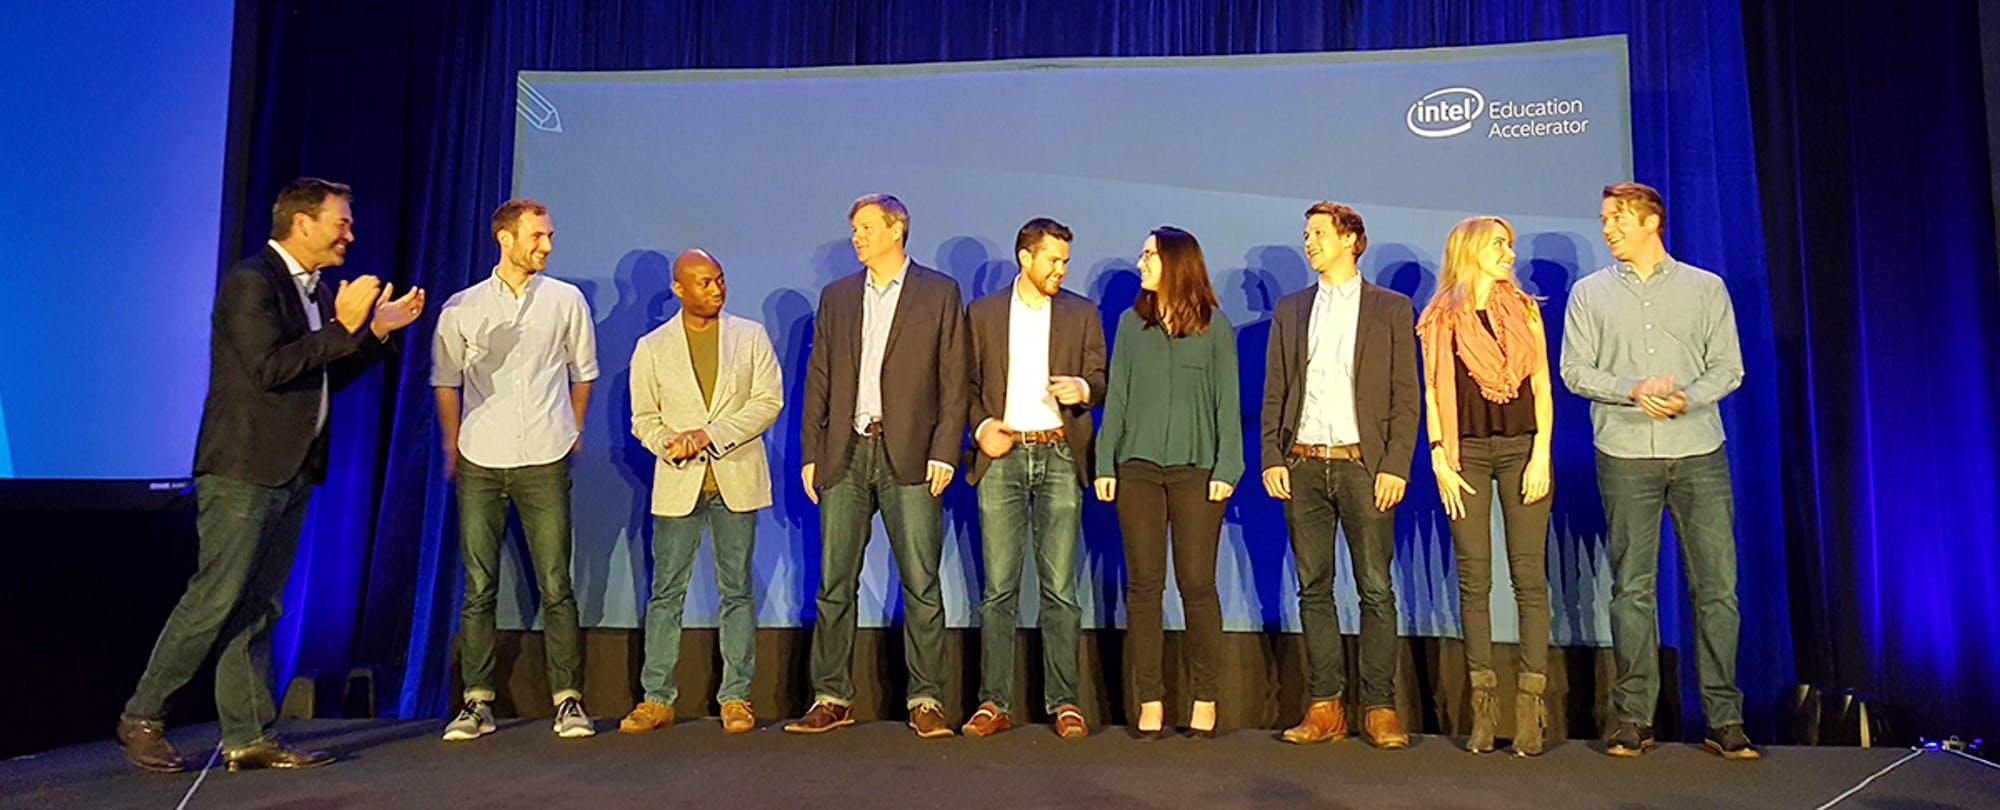 Meet Intel Education Accelerator's Newest Cohort of Edtech Visionaries